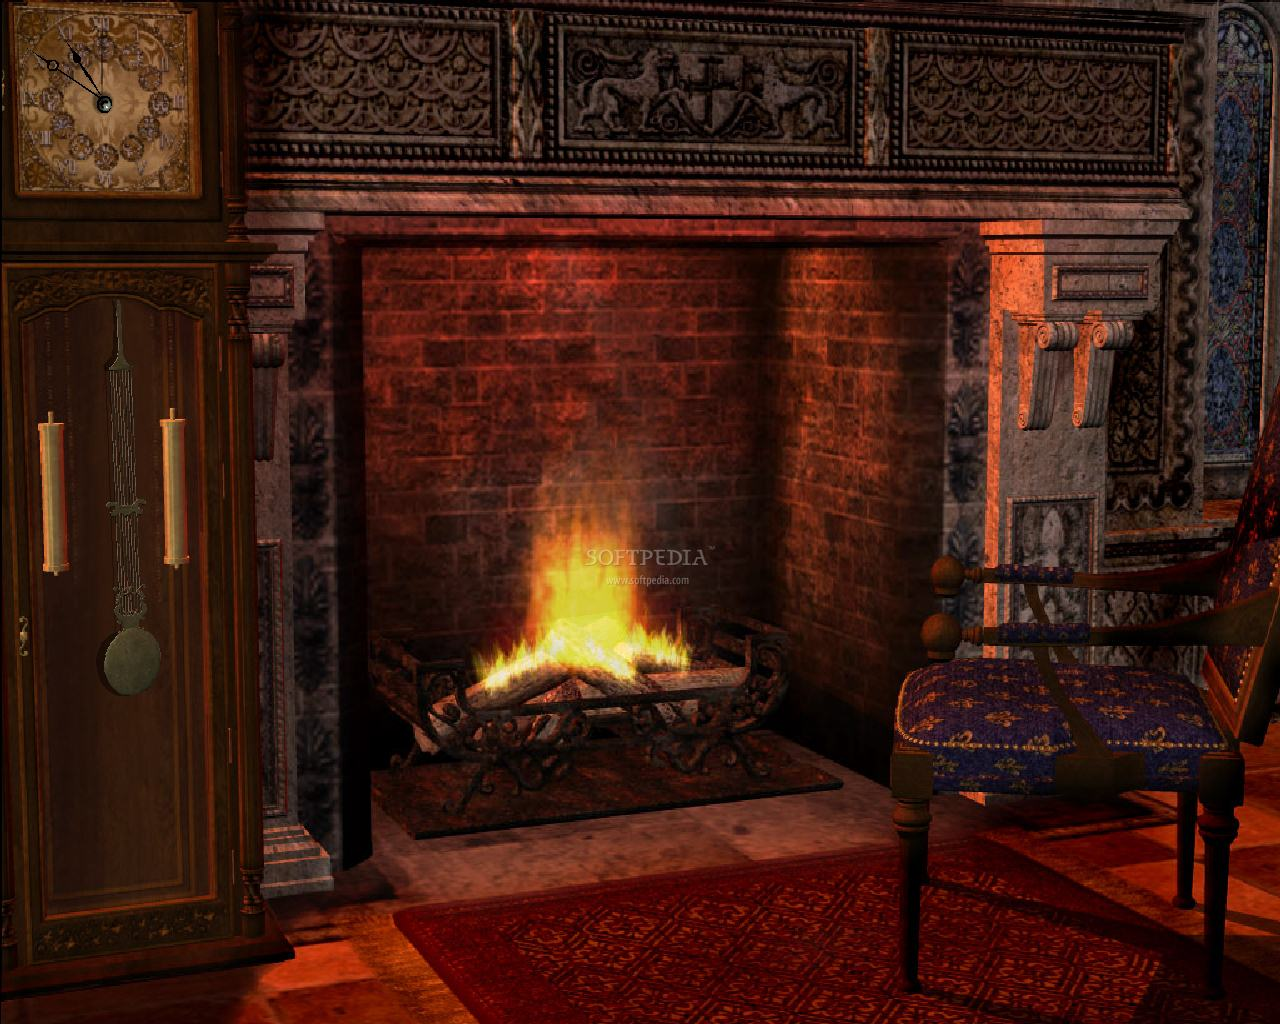 Fireplace clipart animated WallpaperSafari com Animated desktop hd